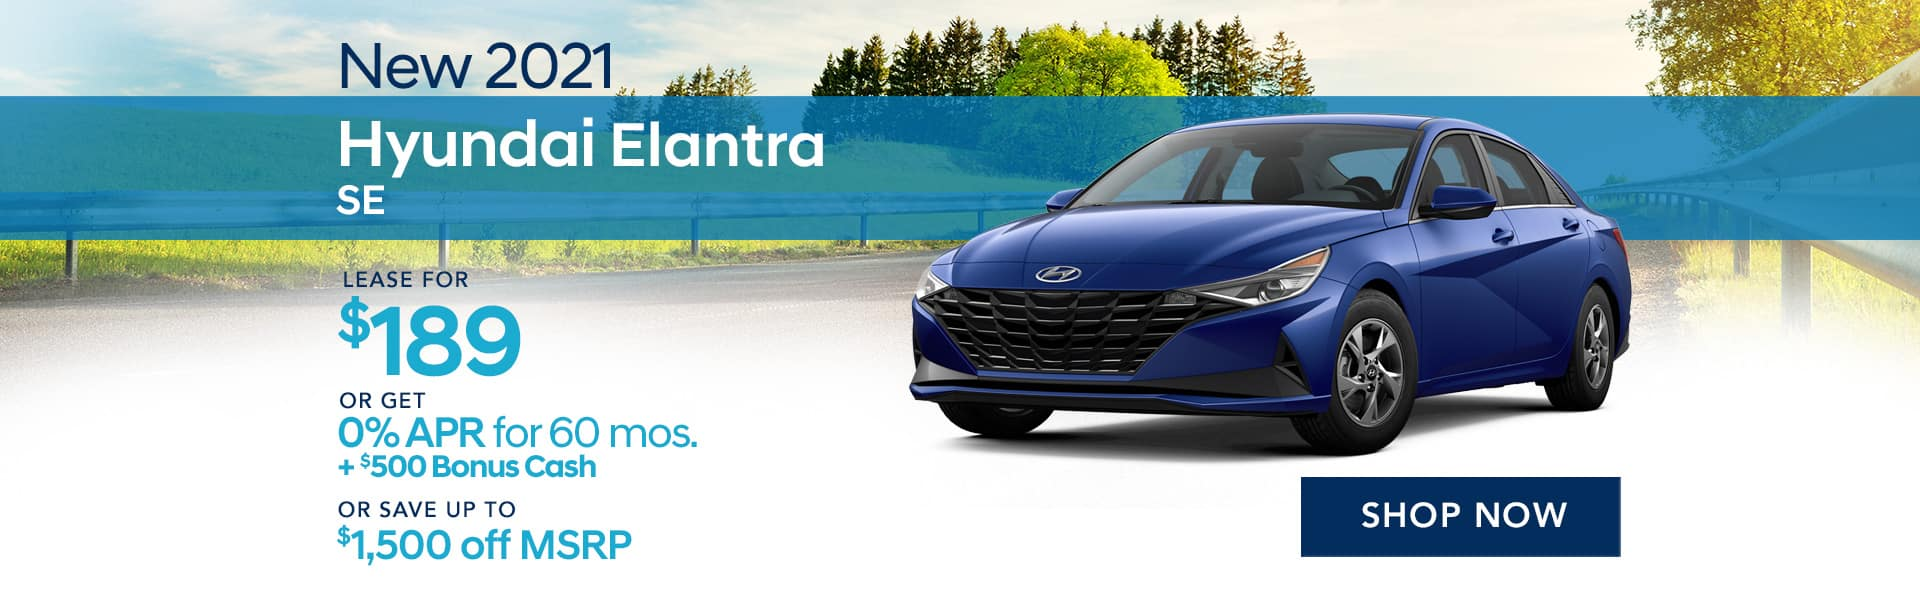 HYH-1920×600-New 2021 Hyundai Elantra SE_-06_21